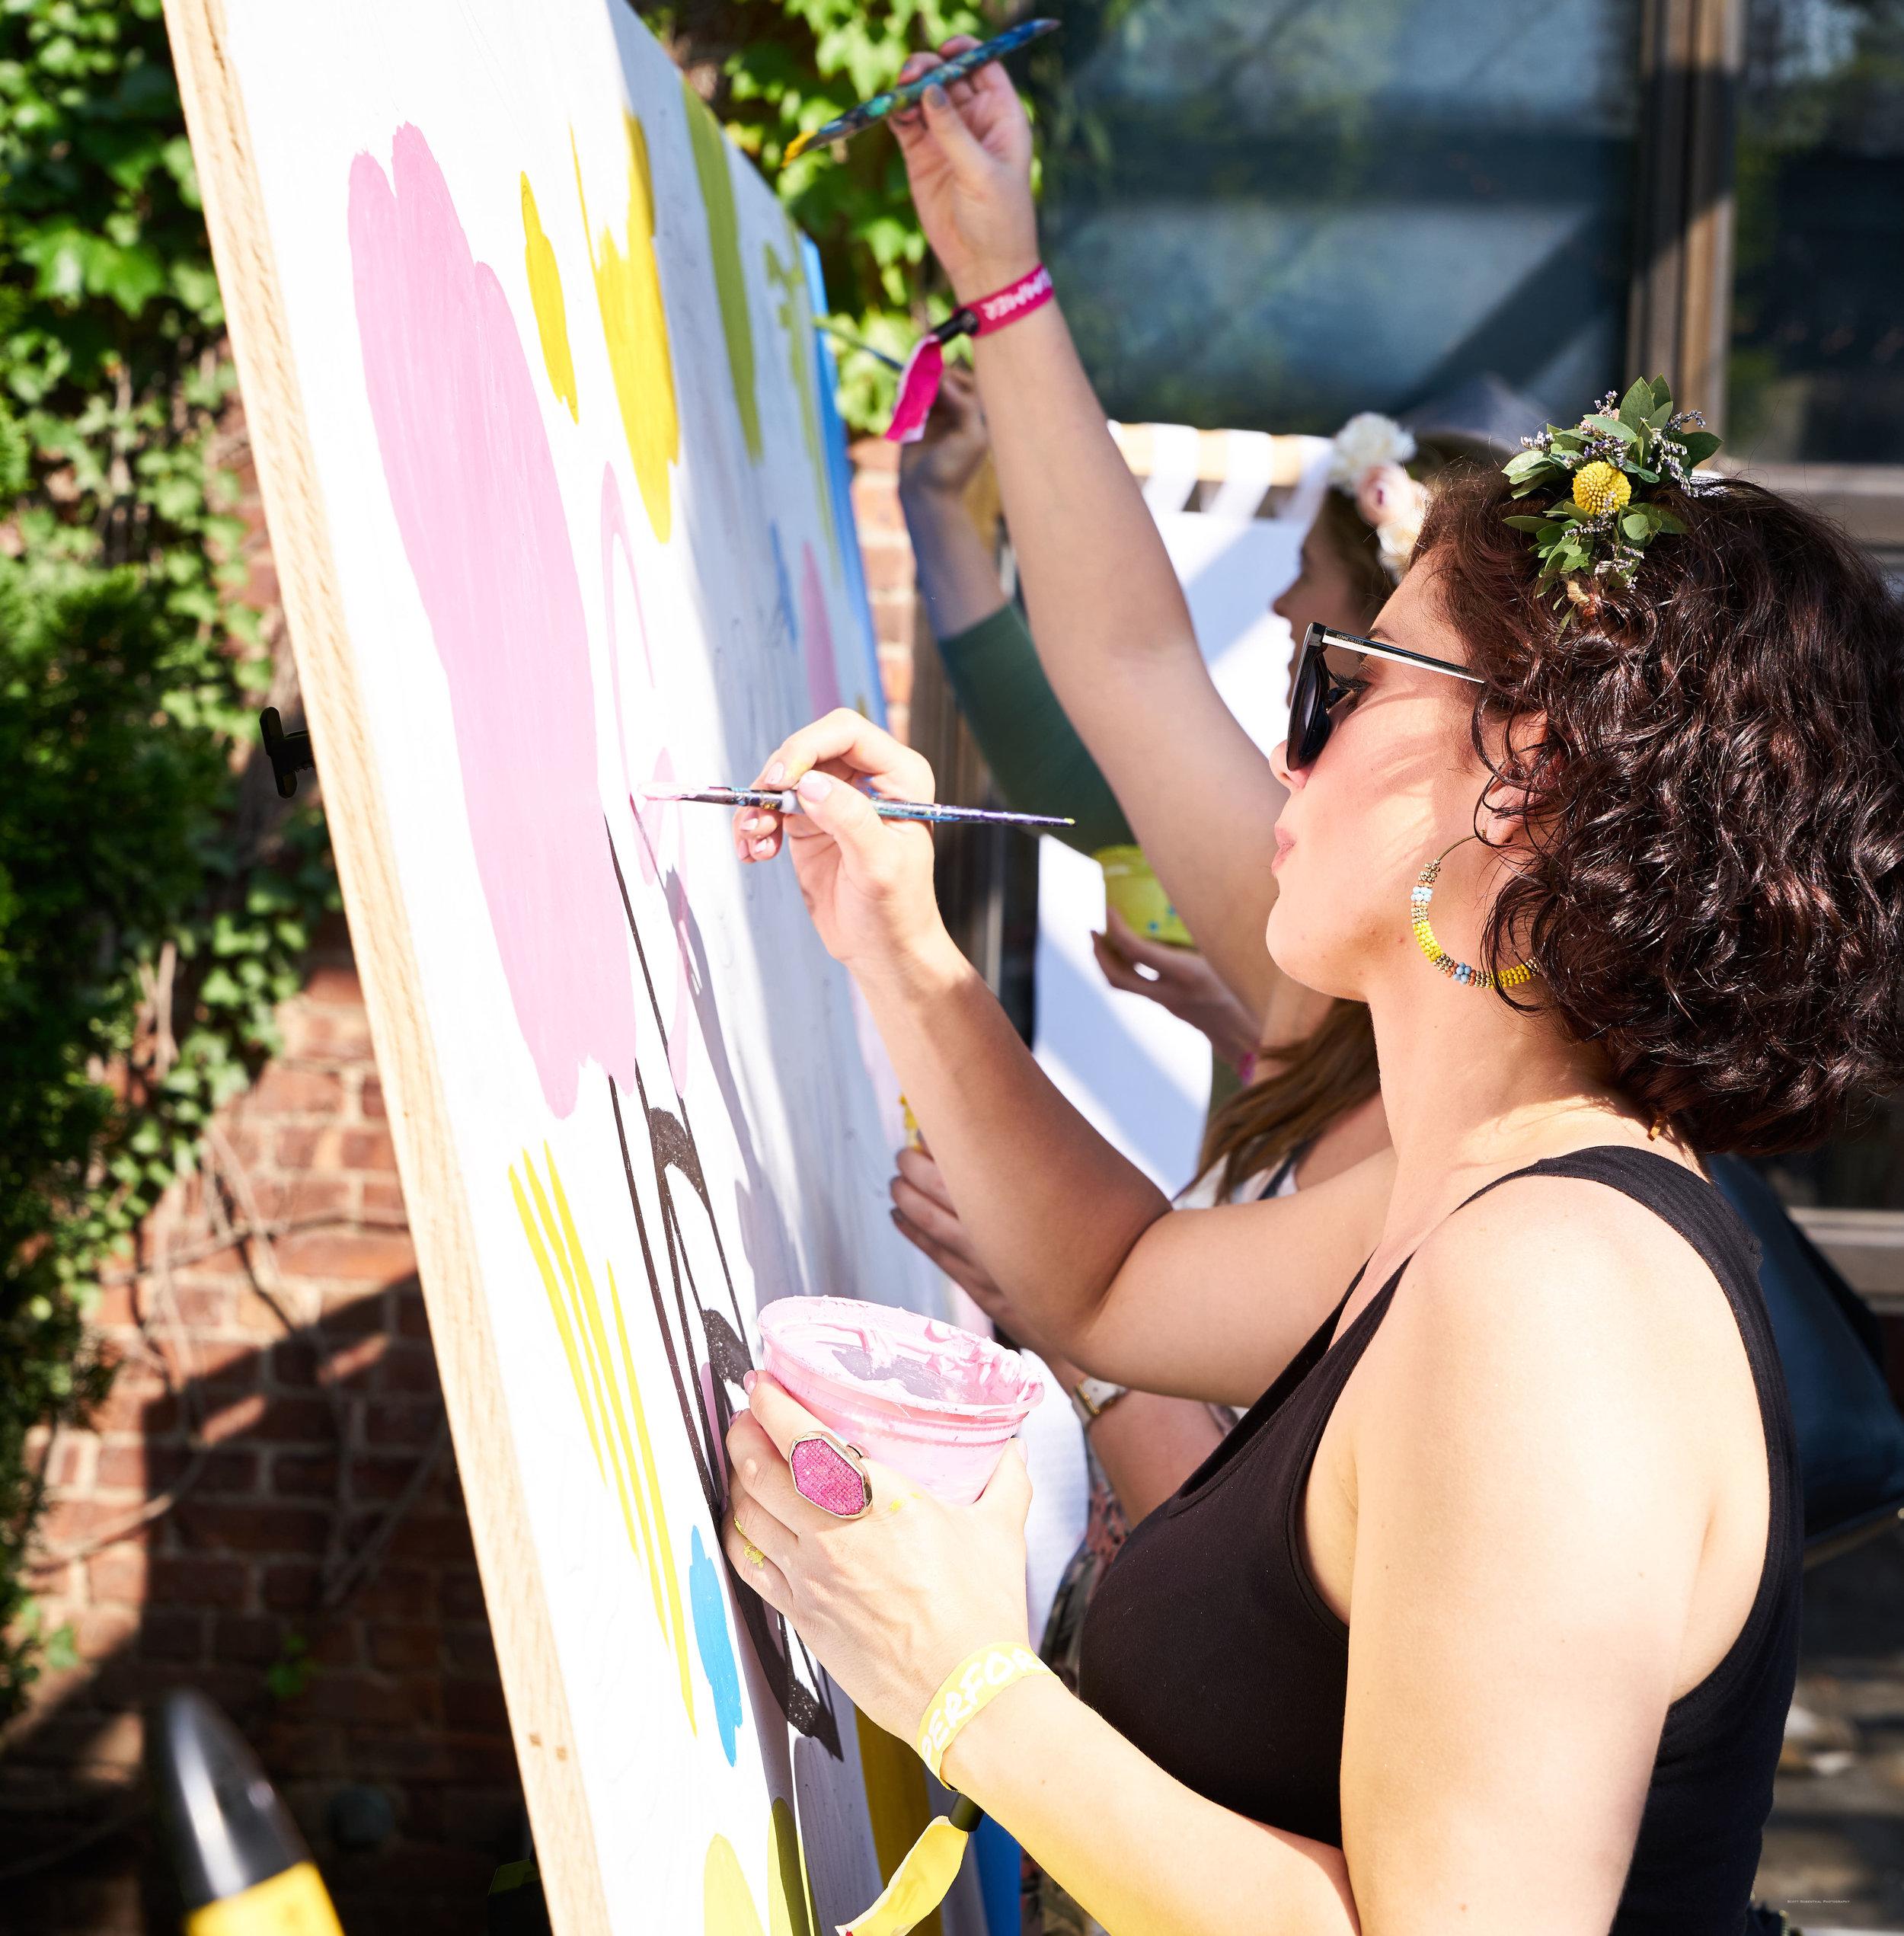 Allison_dayka_live_painting_8.jpg